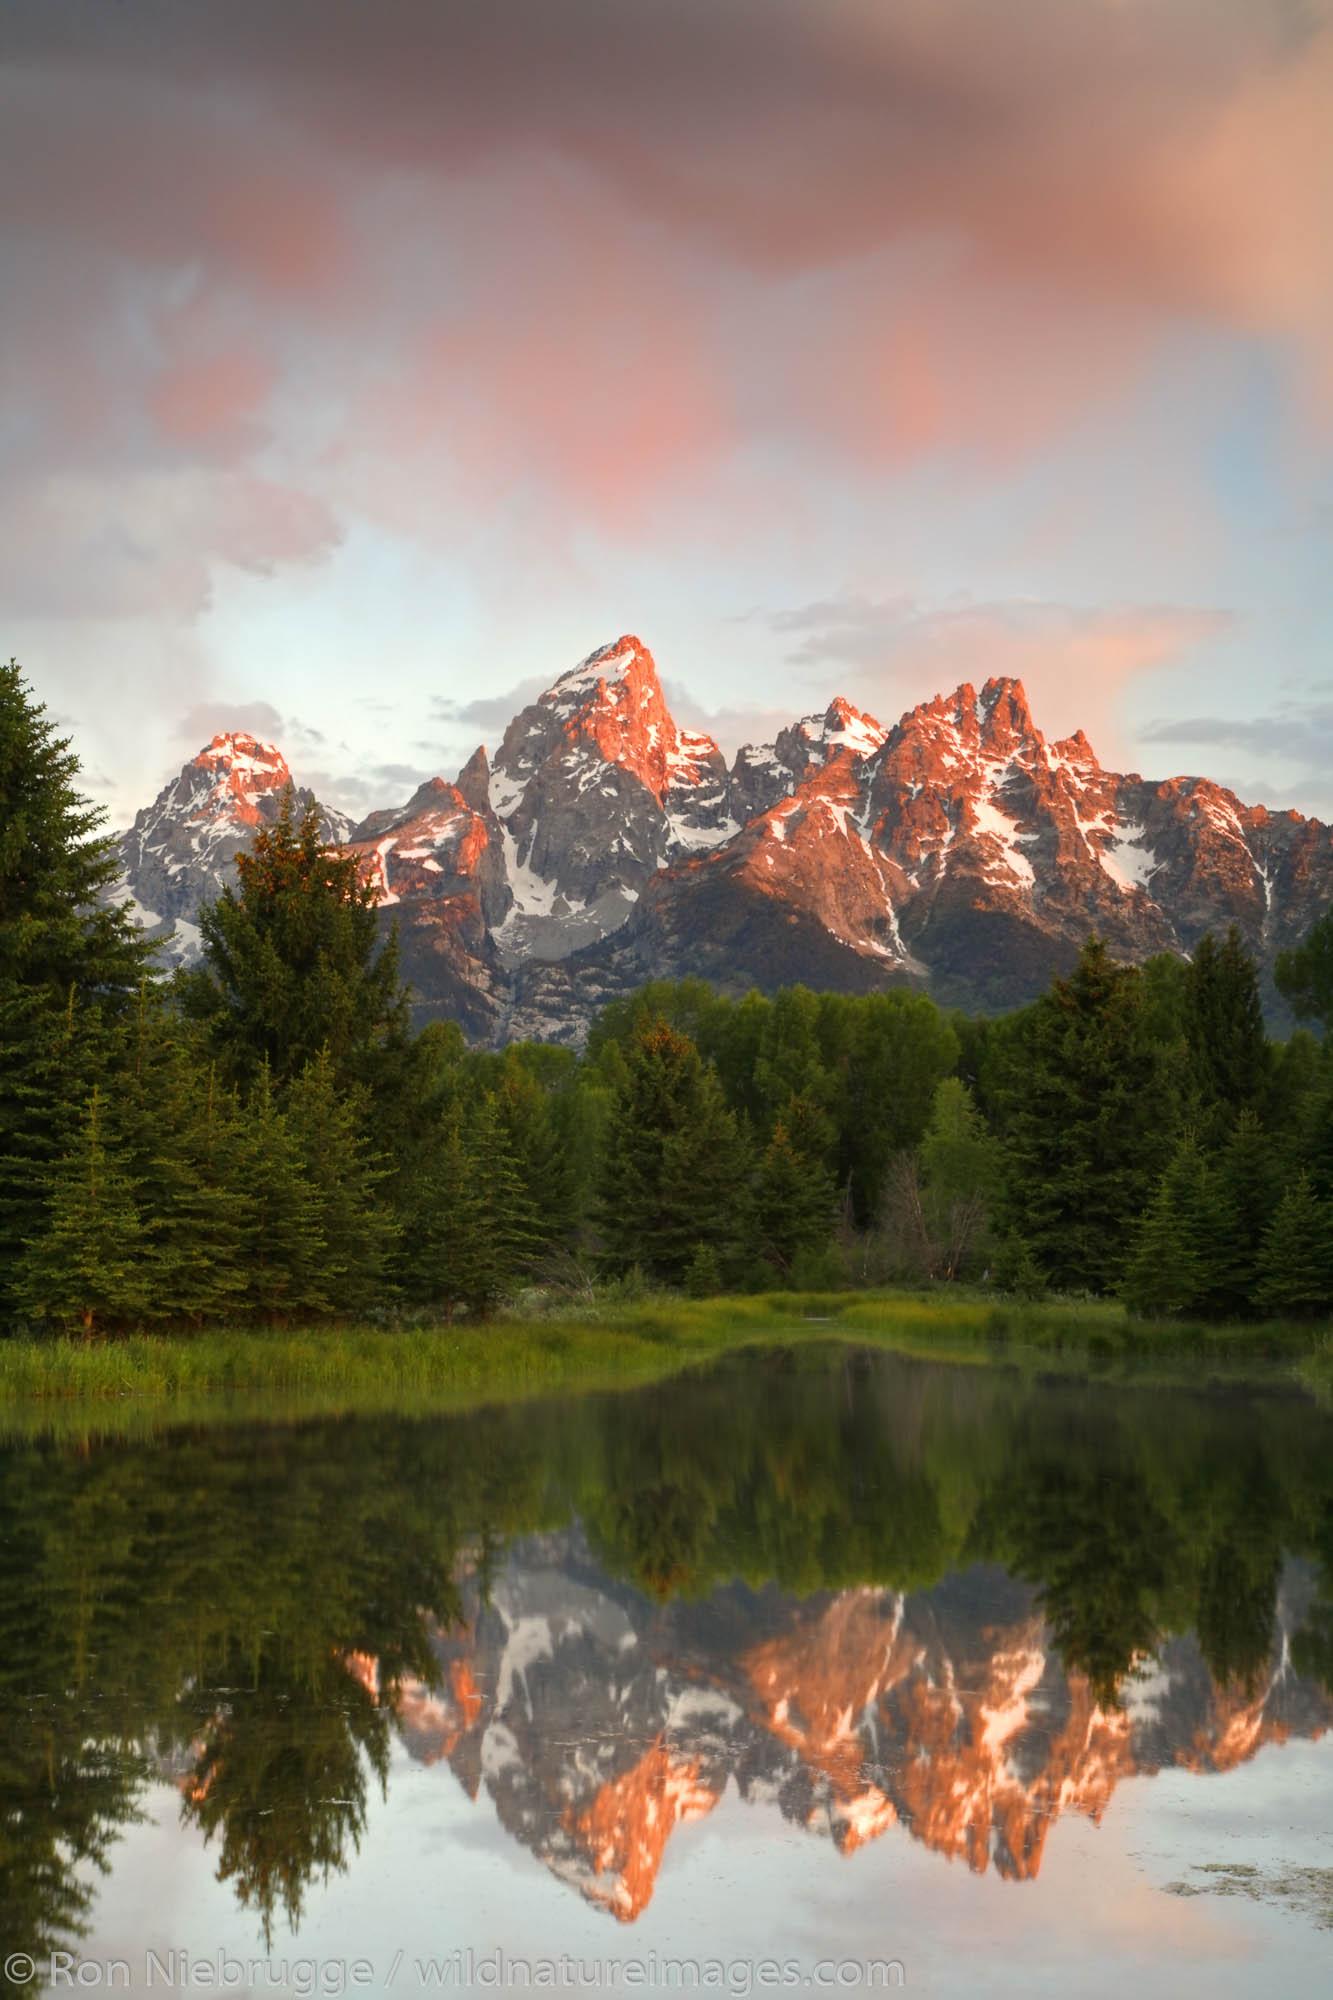 The Teton Range from Schwabacher Landing, Grand Teton National Park, Wyoming.